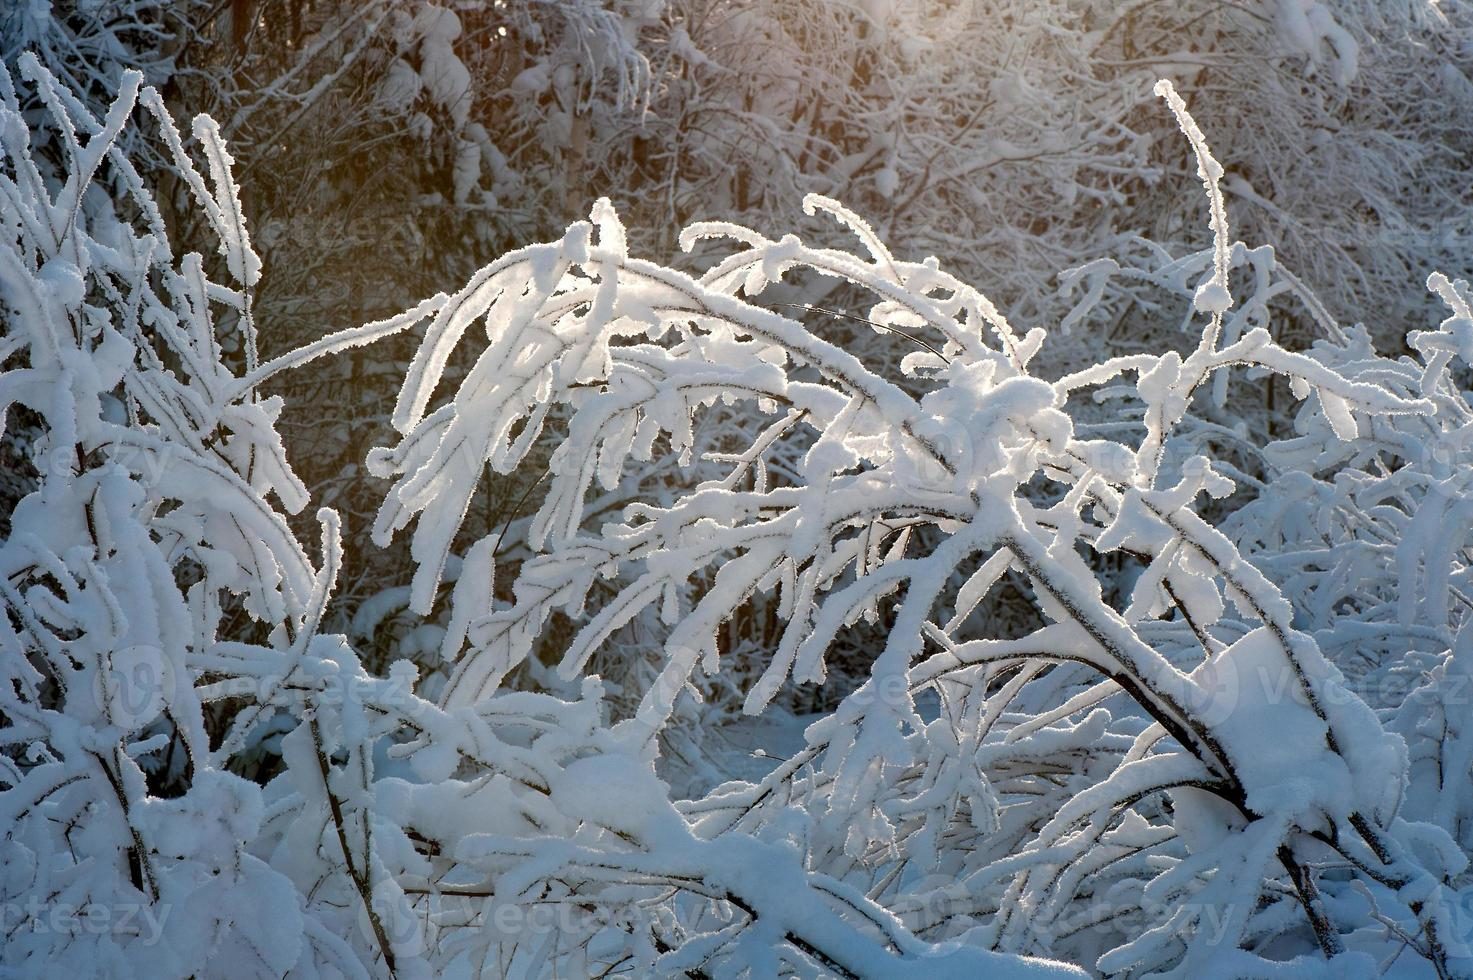 takken bedekt met sneeuw foto